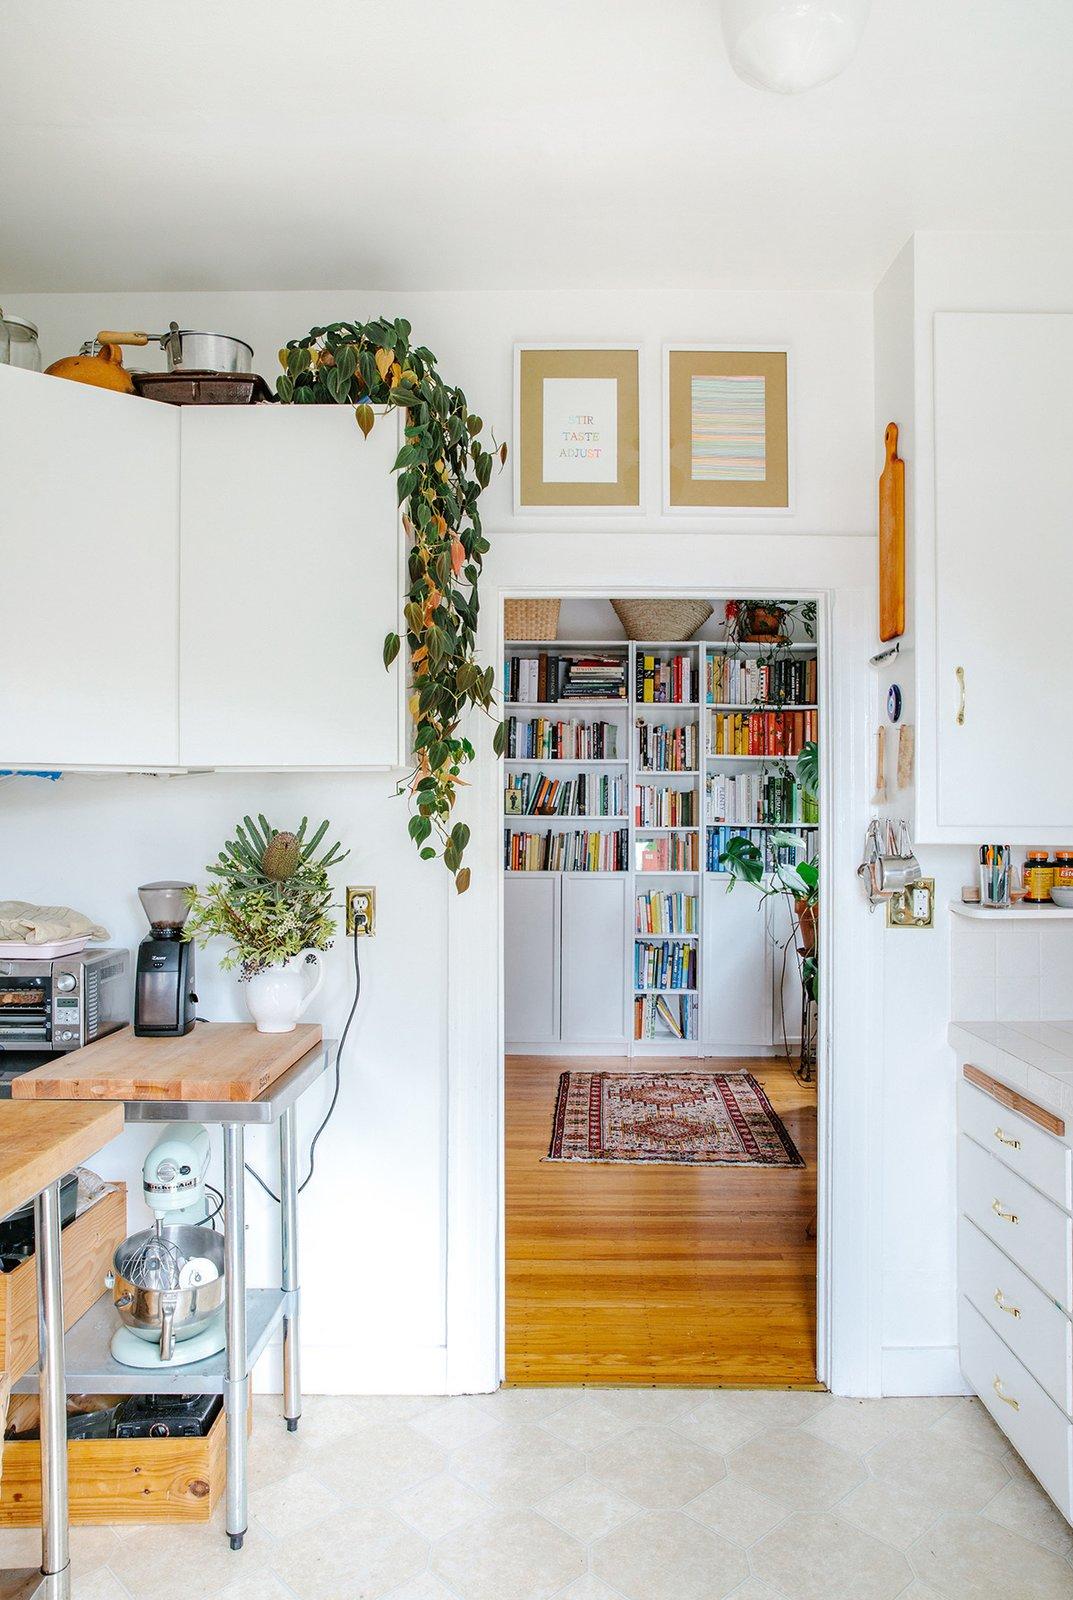 Samin Nosrat's Kitchen